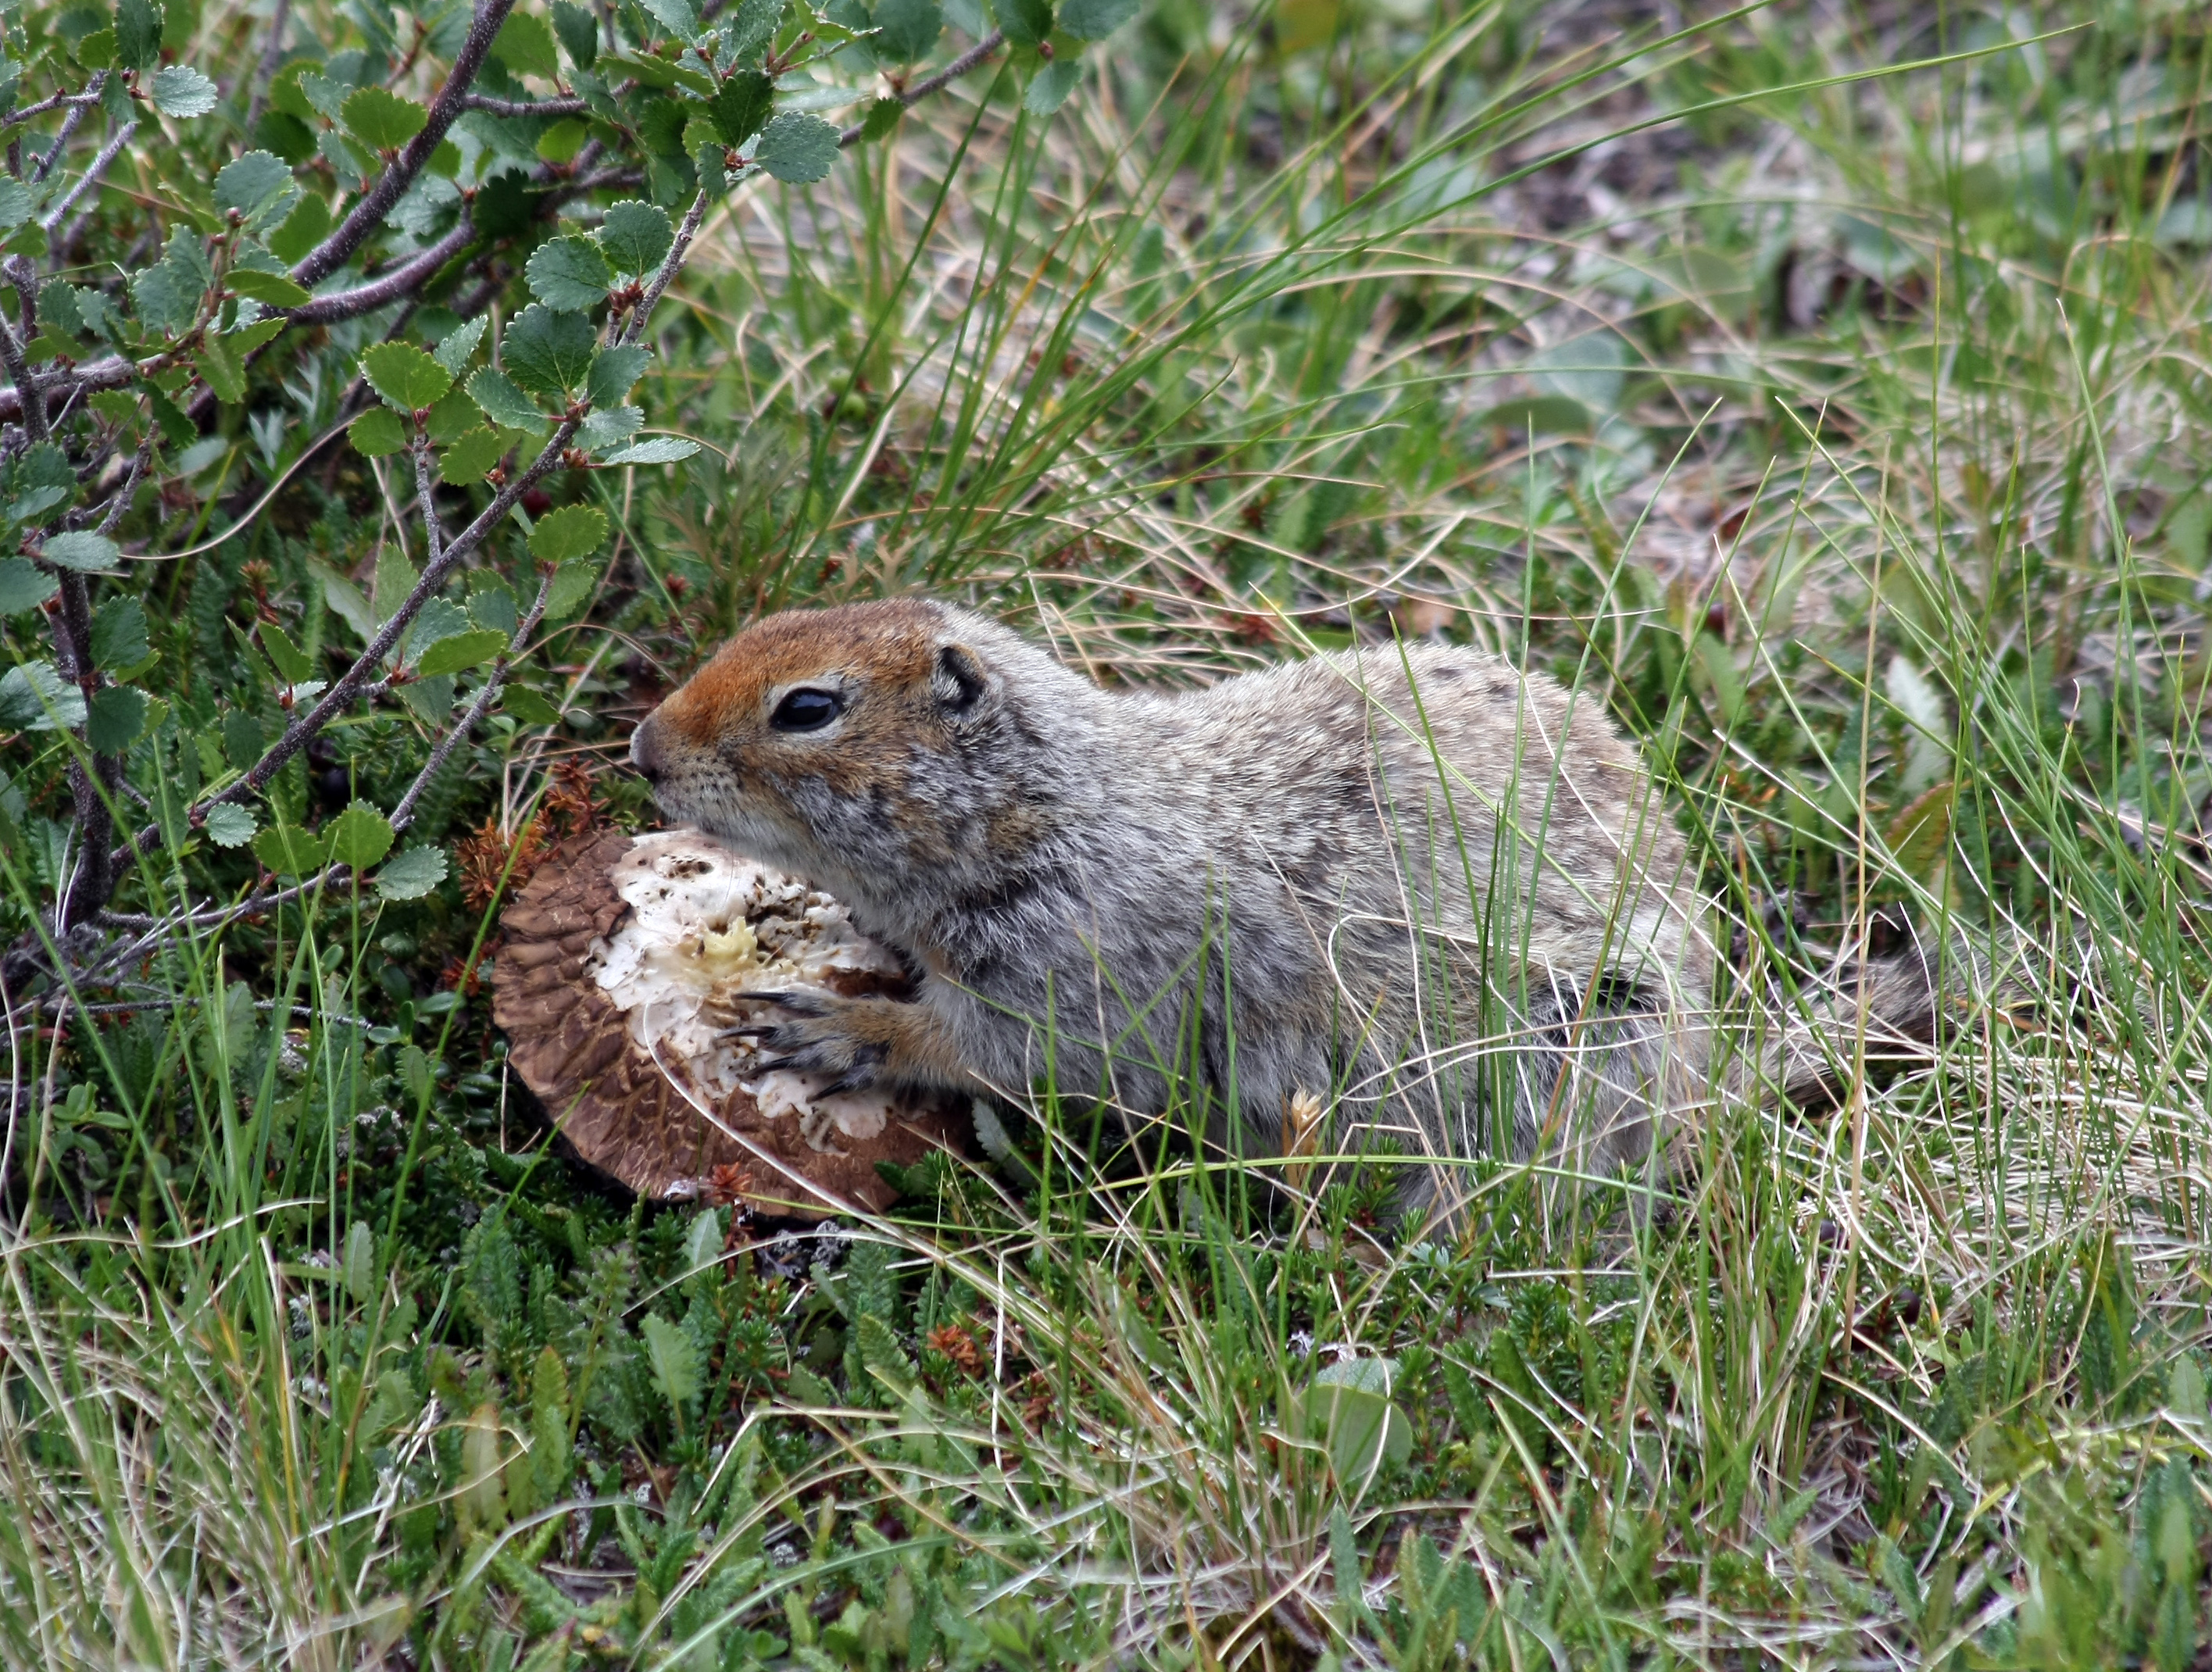 Squirrels Eat Dog Food